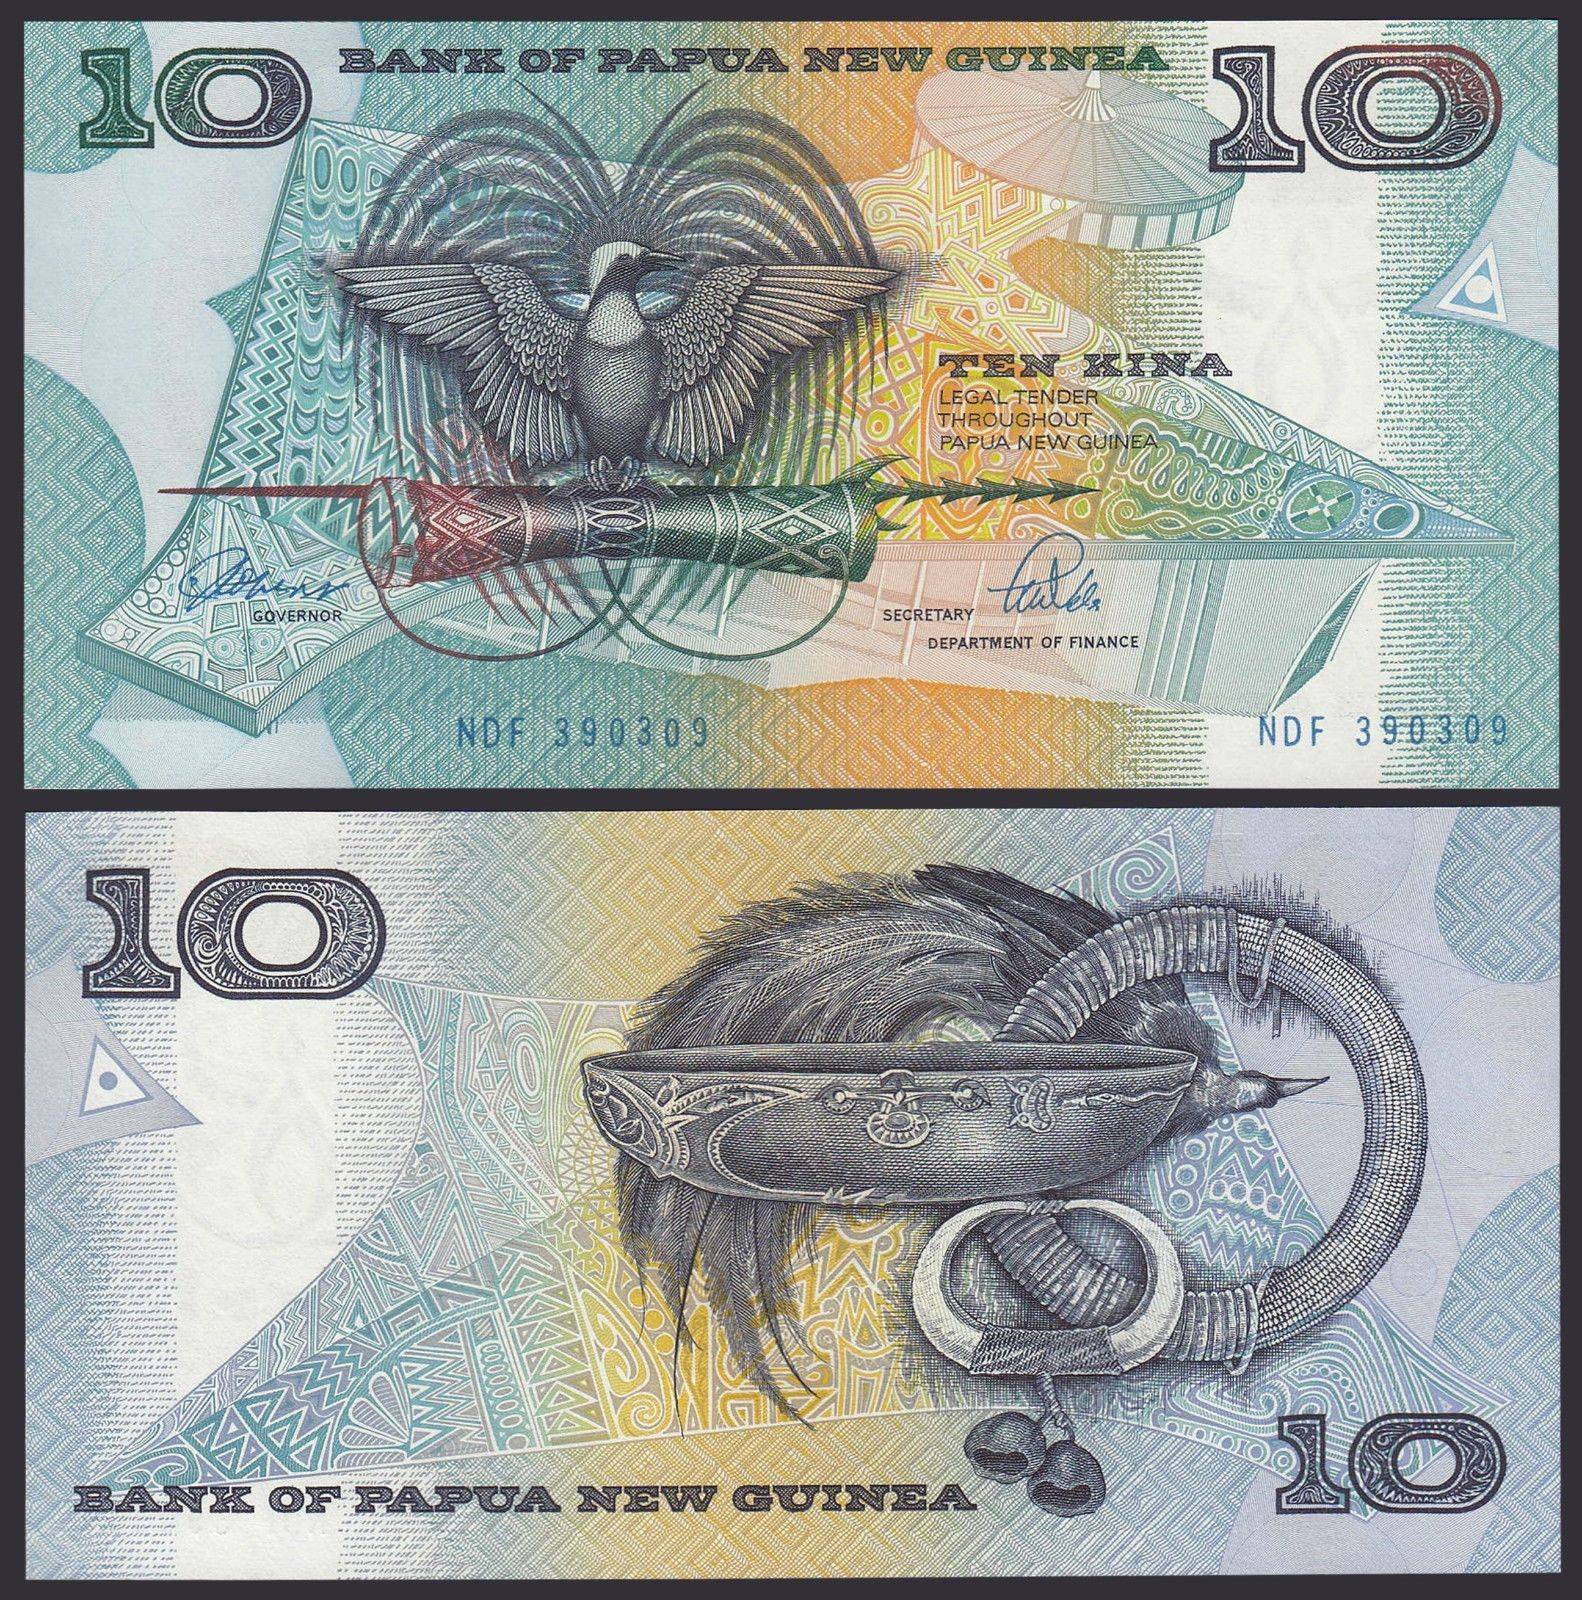 9b 1988 Pick 9 ND PAPUA NEW GUINEA,10 Kina UNC